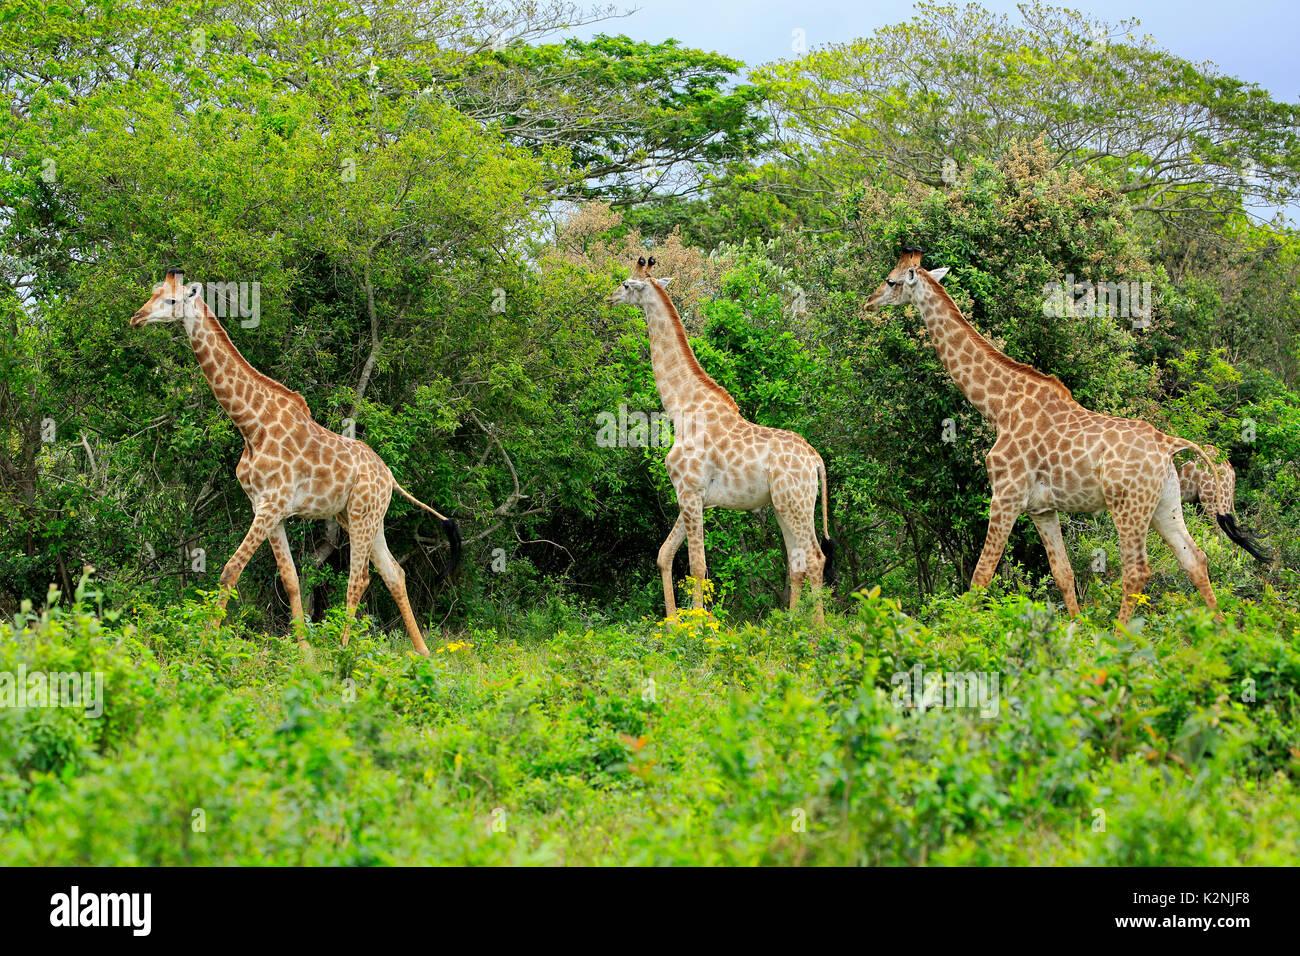 Cape giraffes (Giraffa camelopardalis giraffa), adult, group, food search, Saint Lucia Estuary, Isimangaliso Wetland Park - Stock Image